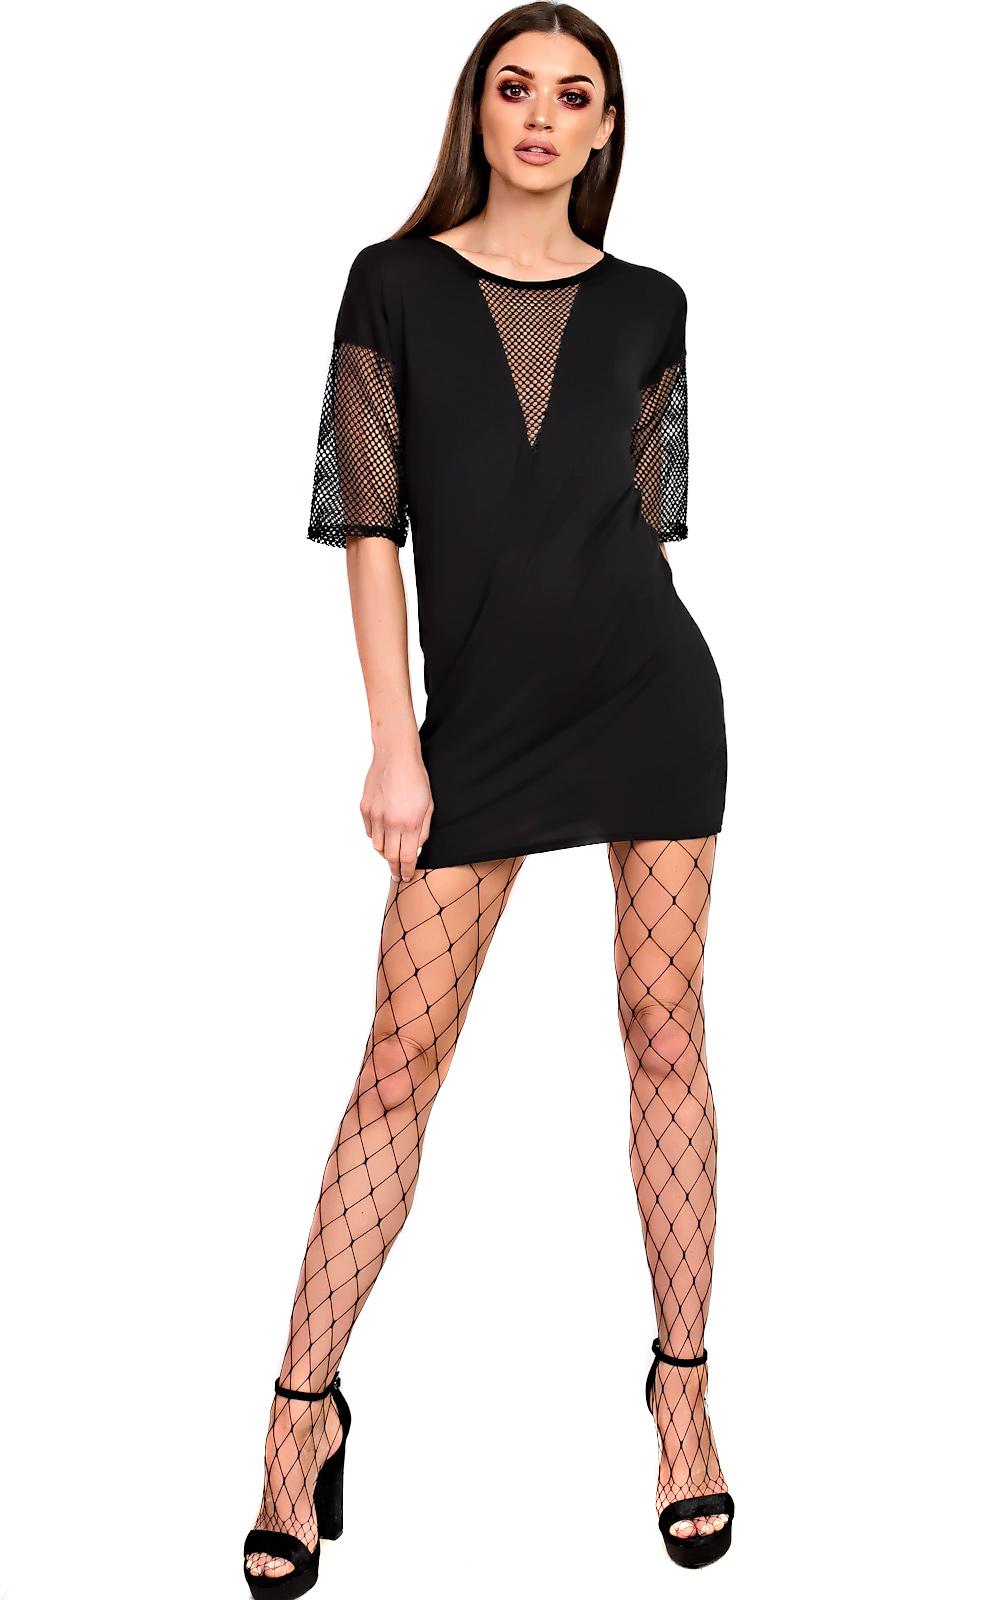 Ikrush balay net detail t shirt dress